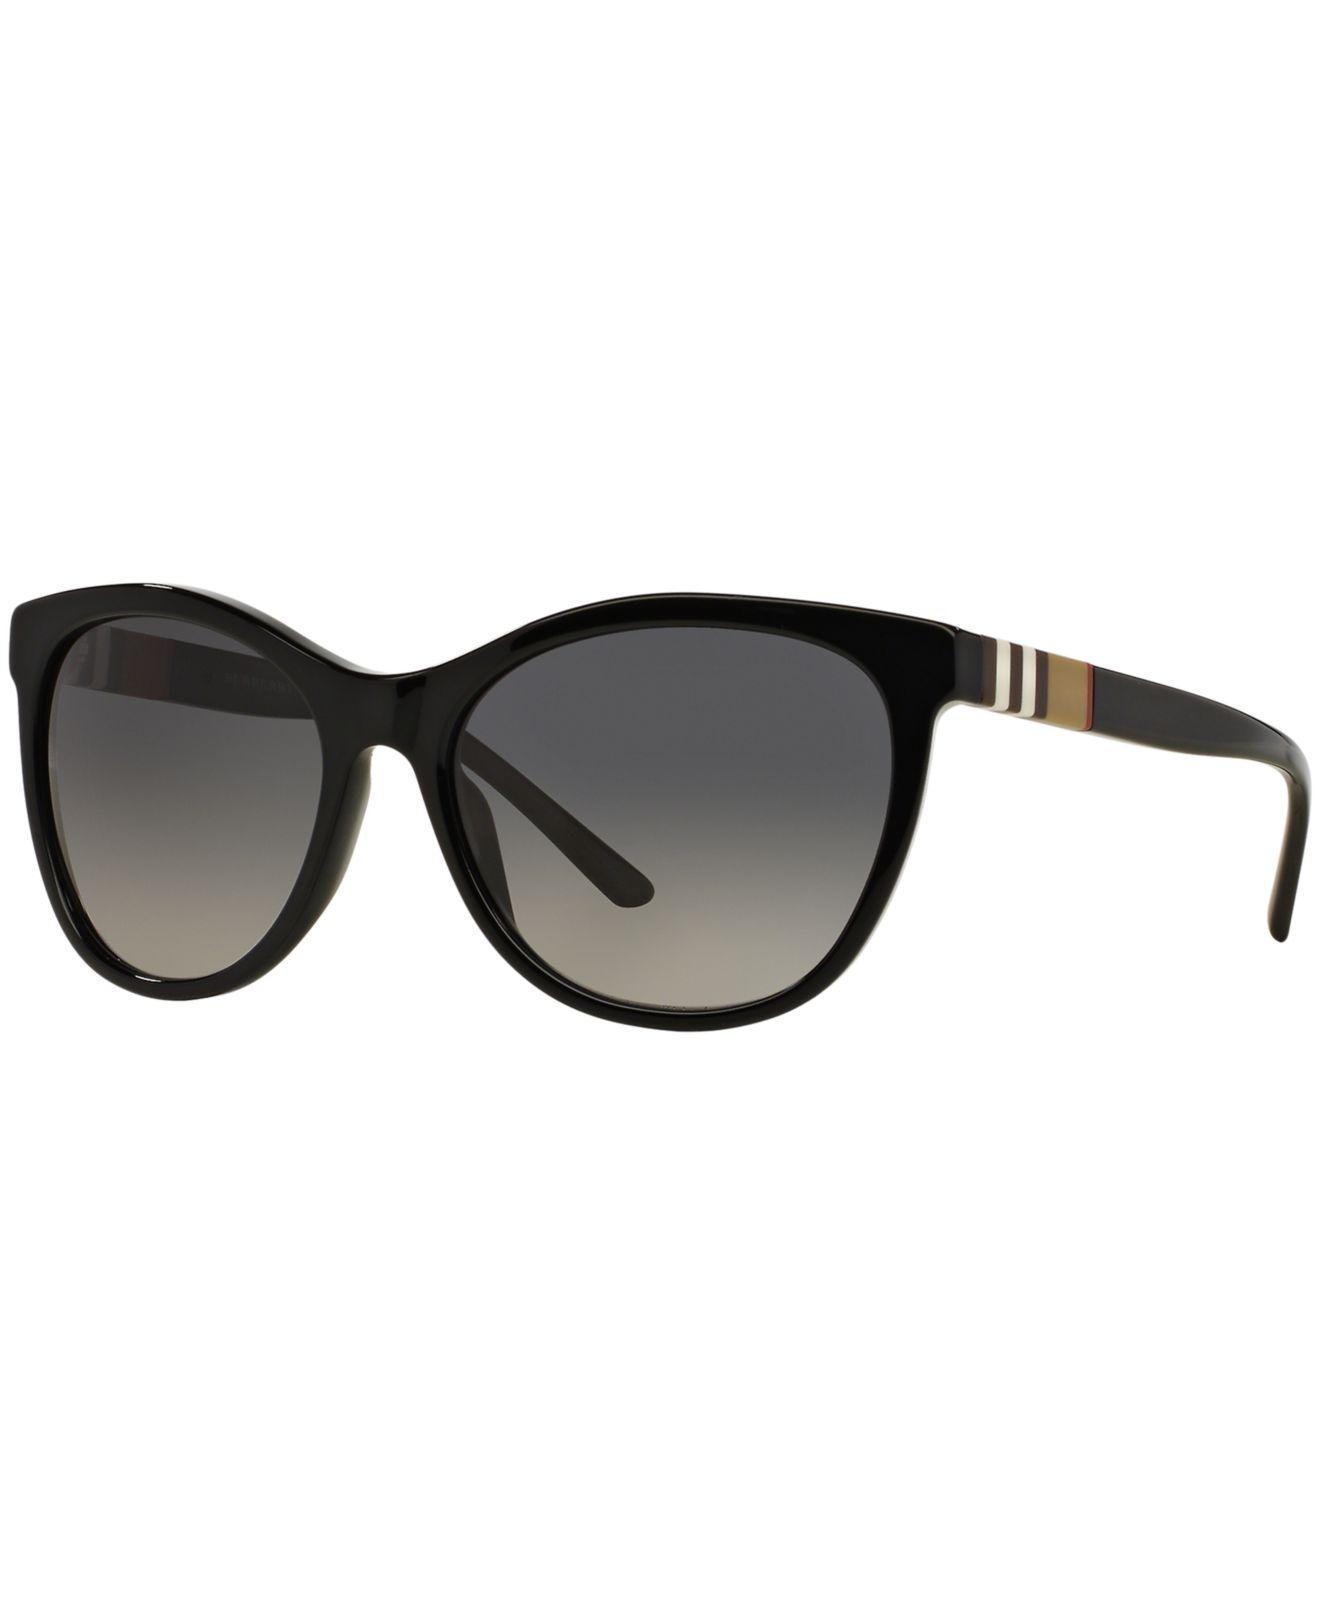 951e03f5f6 Burberry. Women s Black Sunglasses ...